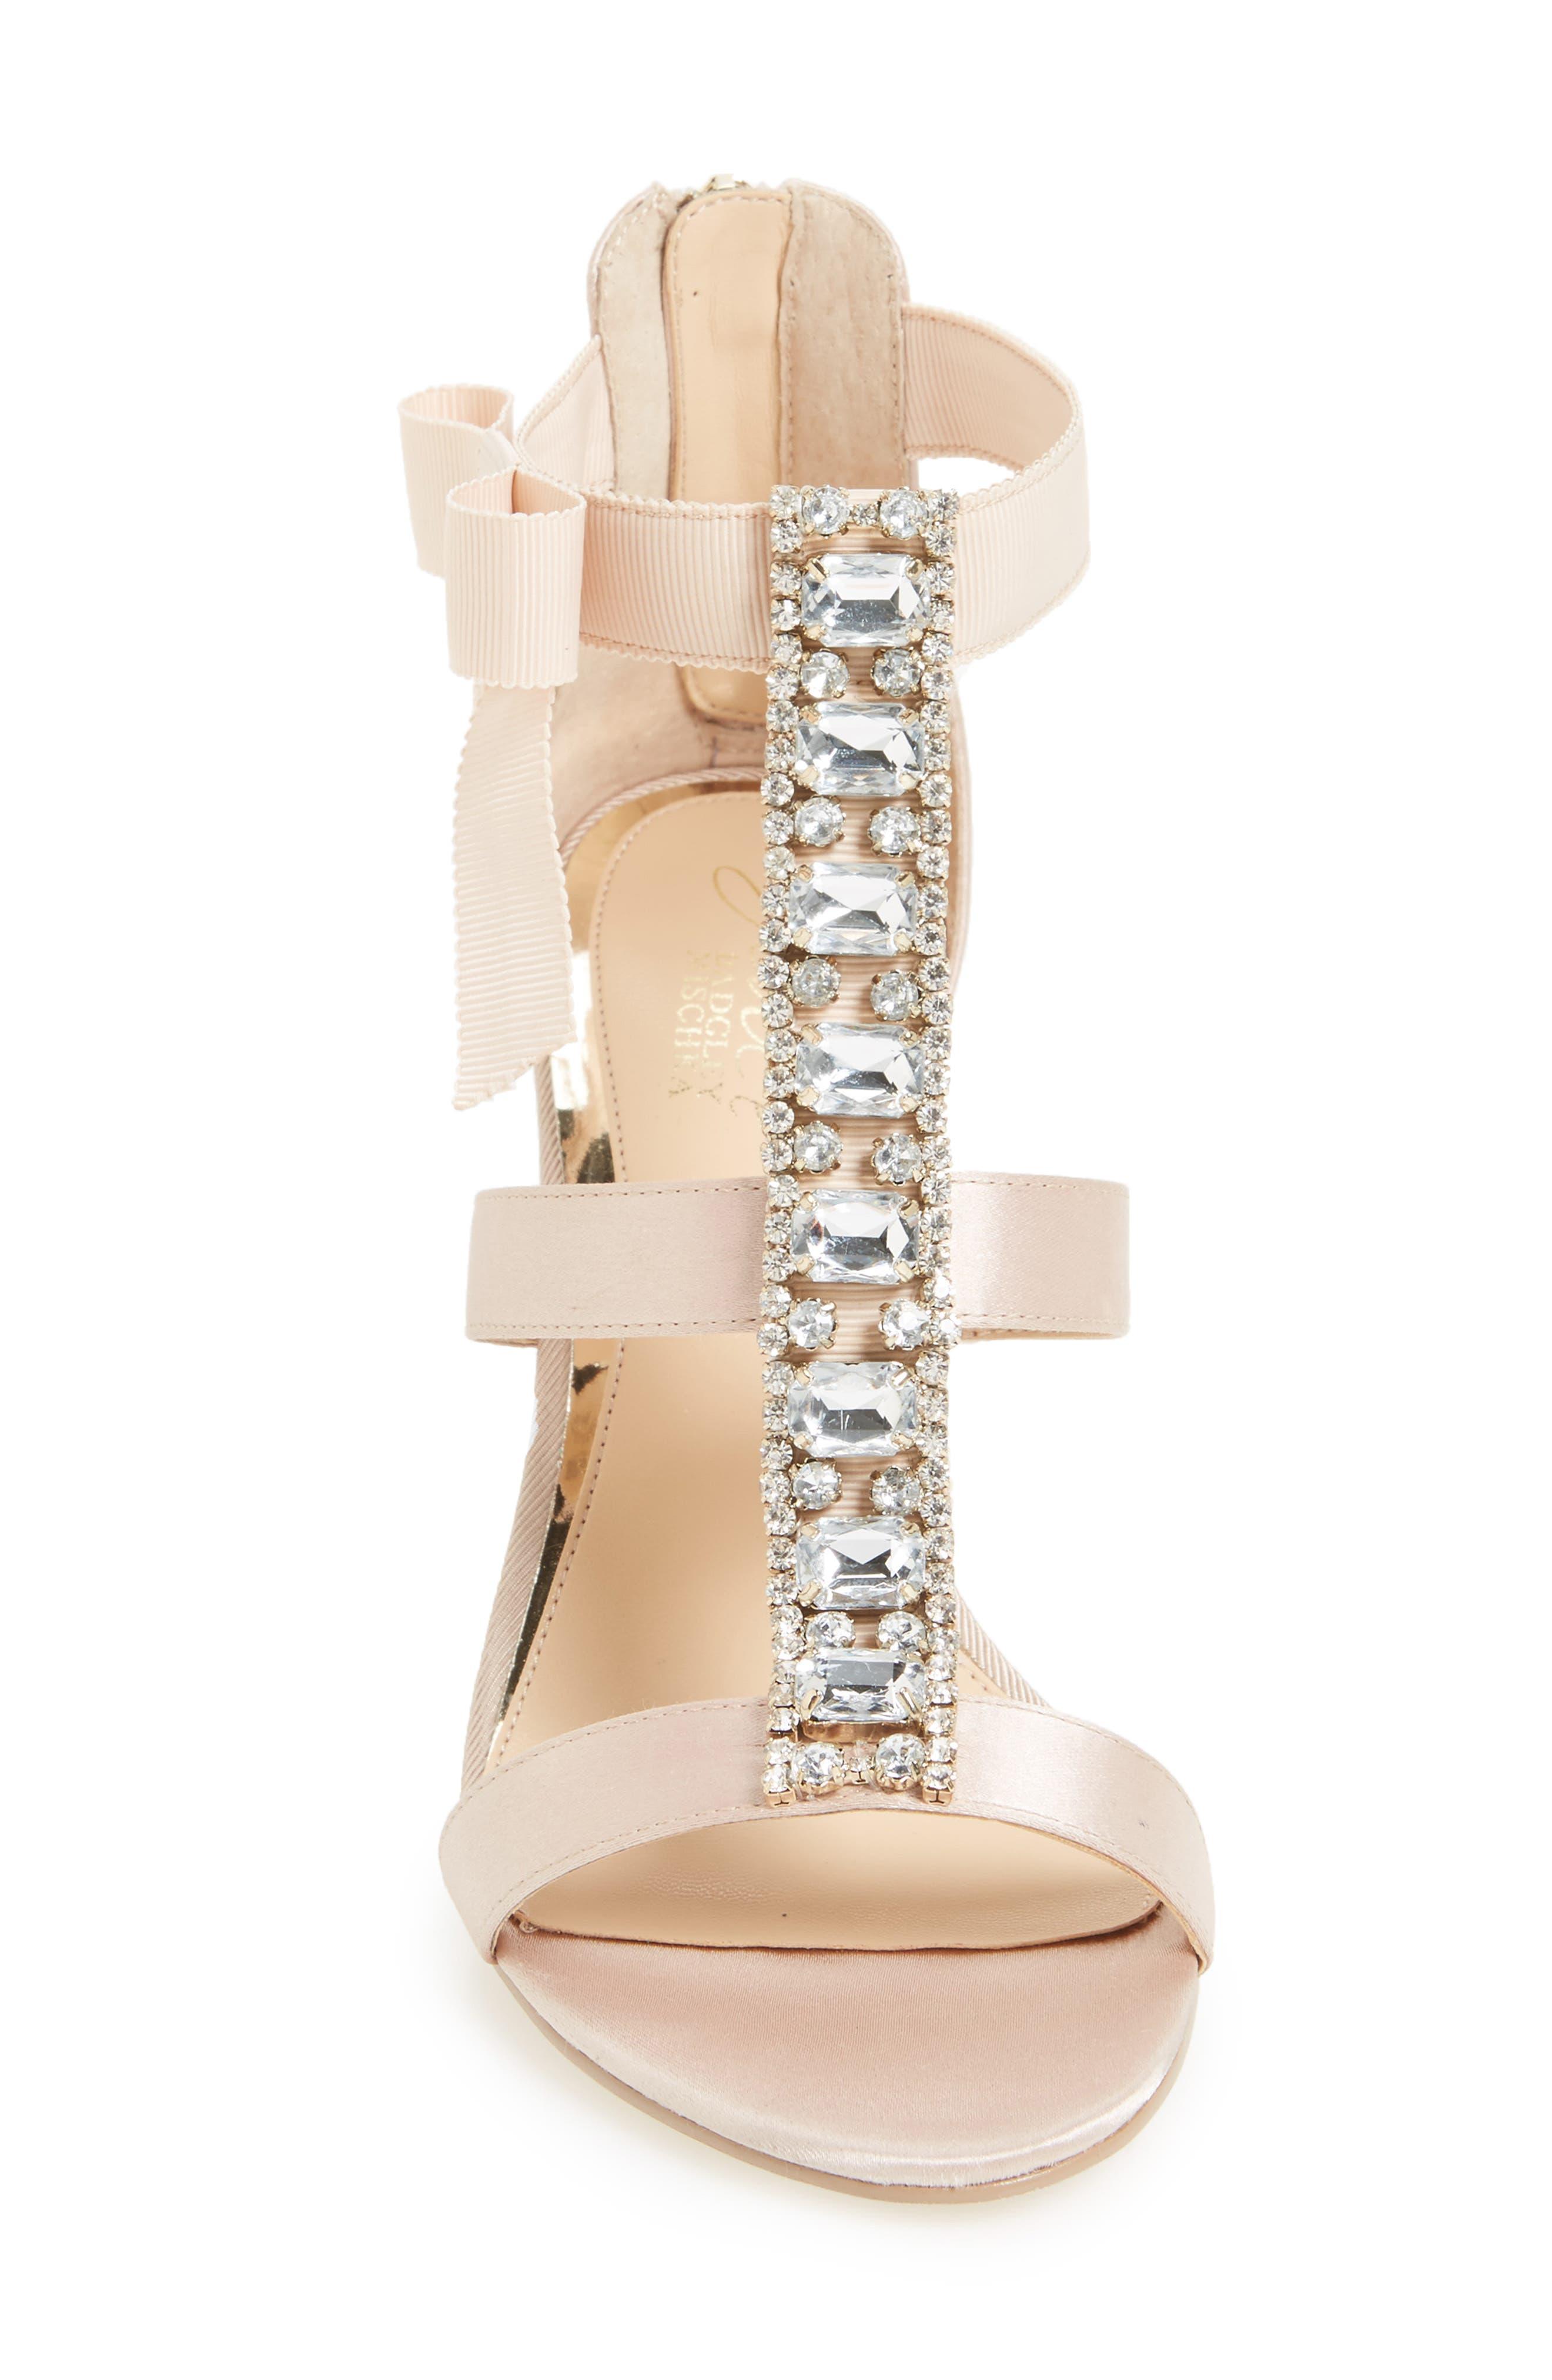 Henderson Embellished Bow Sandal,                             Alternate thumbnail 3, color,                             CHAMPAGNE SATIN